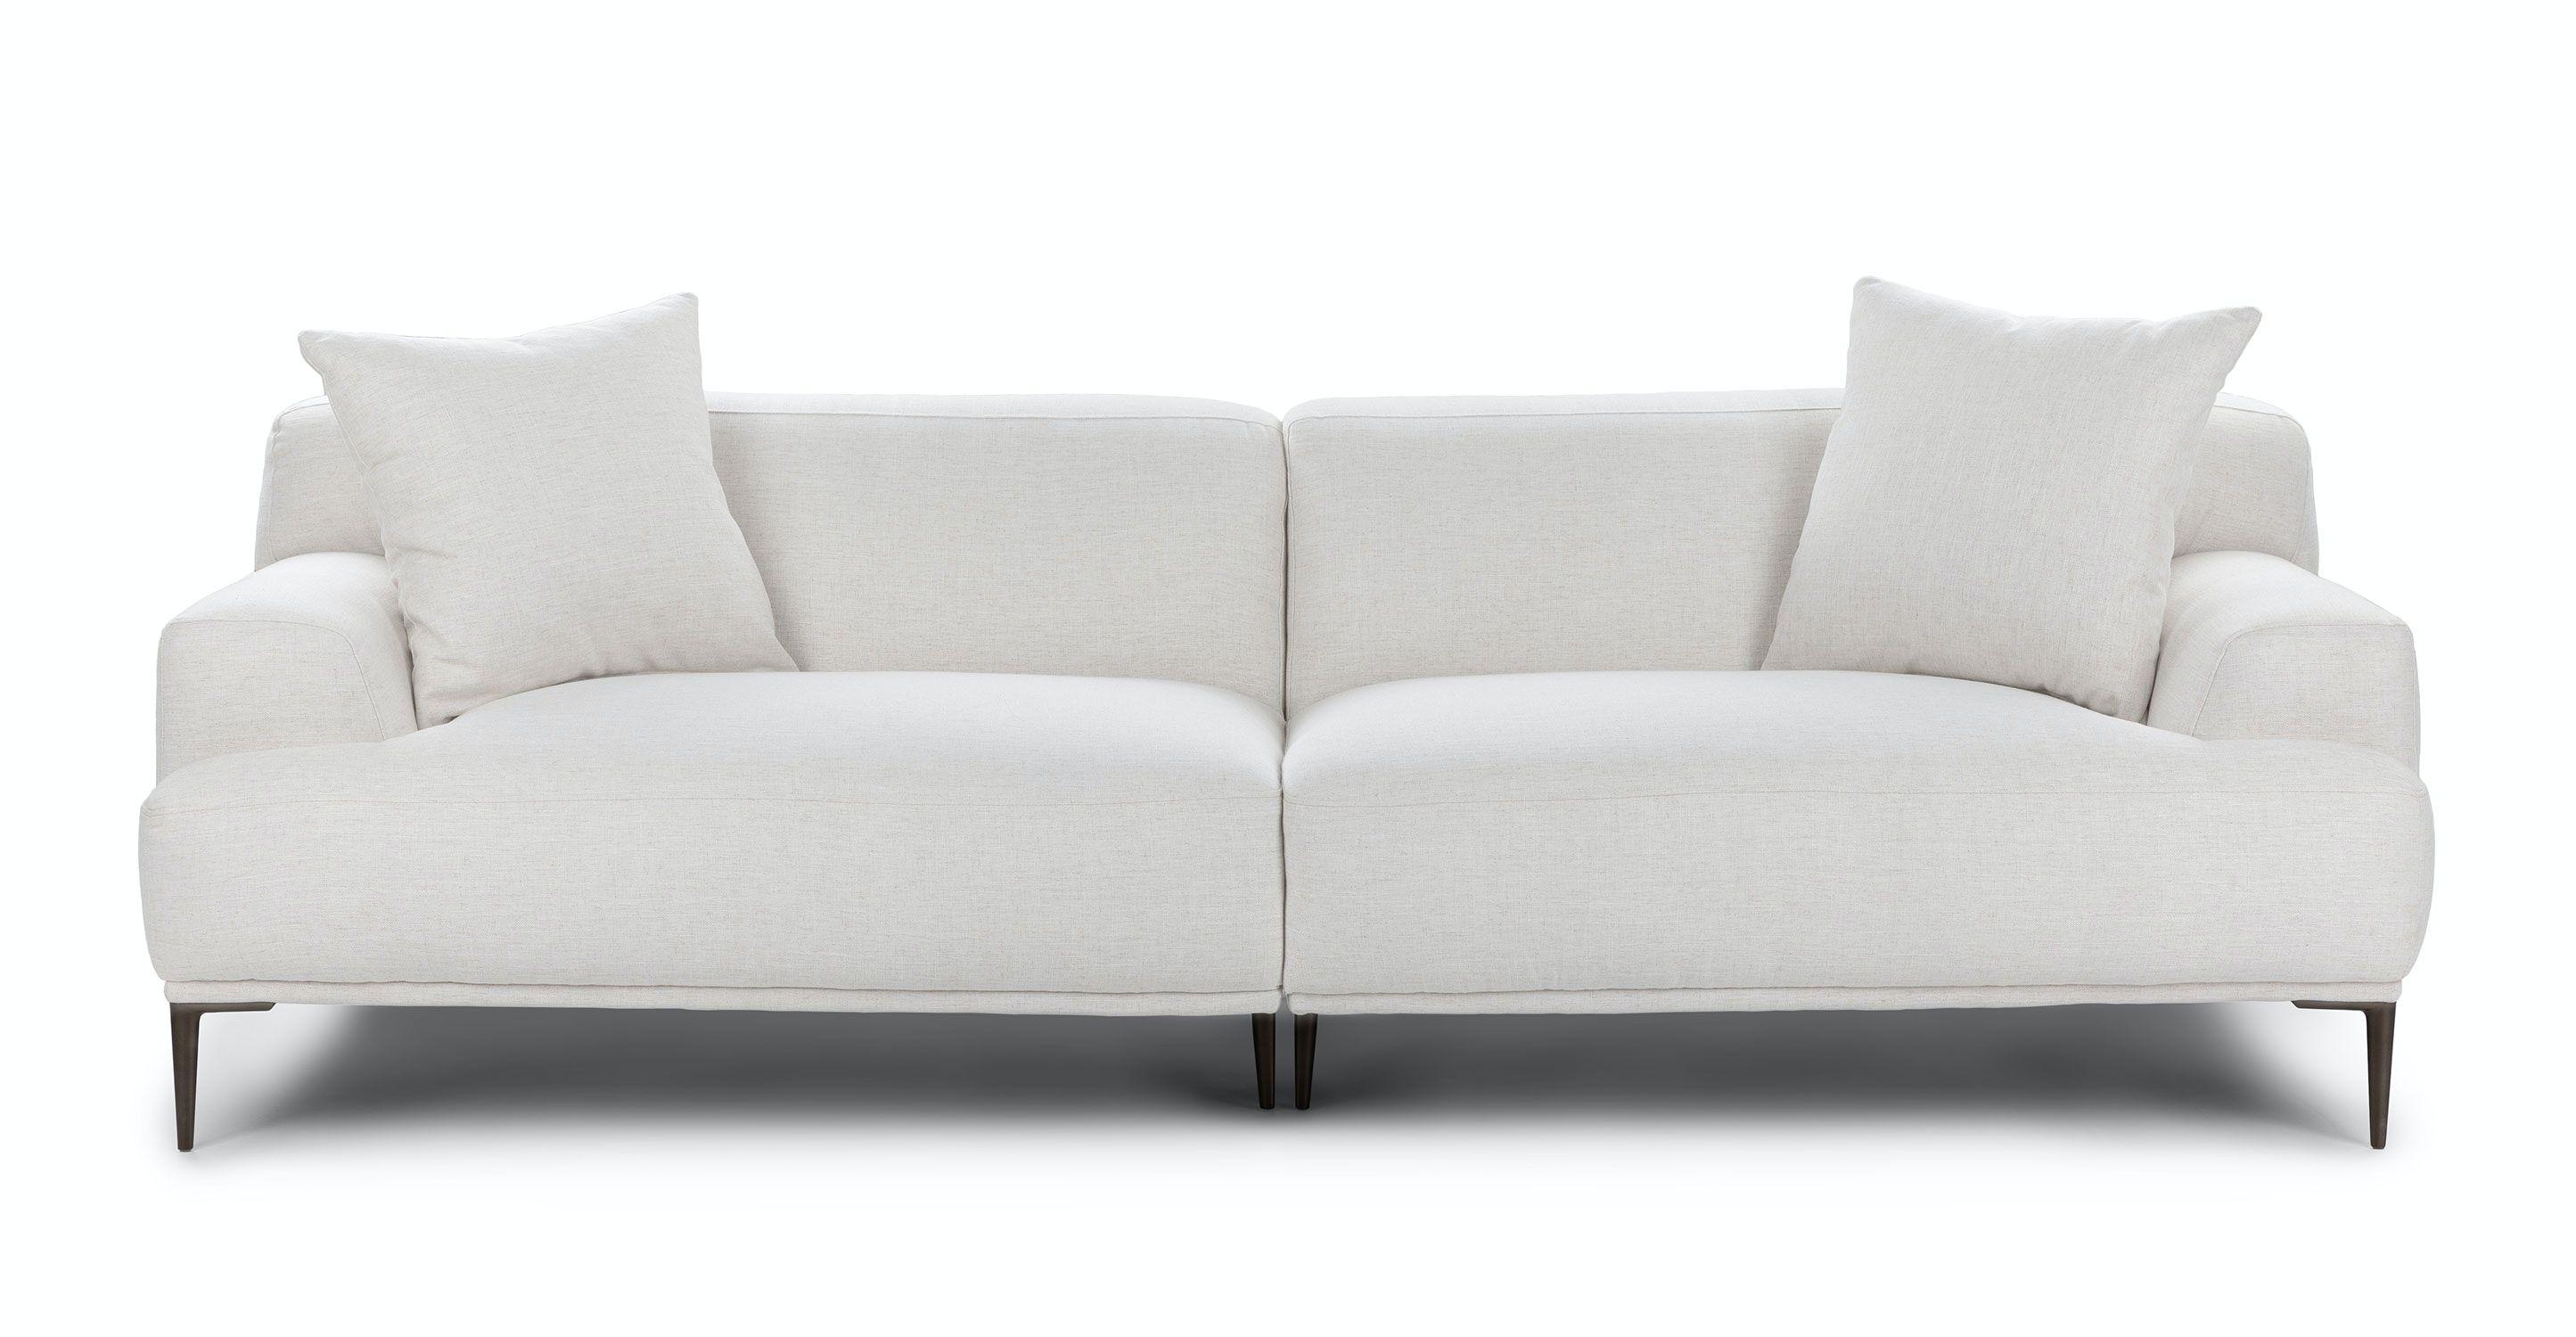 Abisko Quartz White Sofa In 2020 Contemporary Decor Living Room